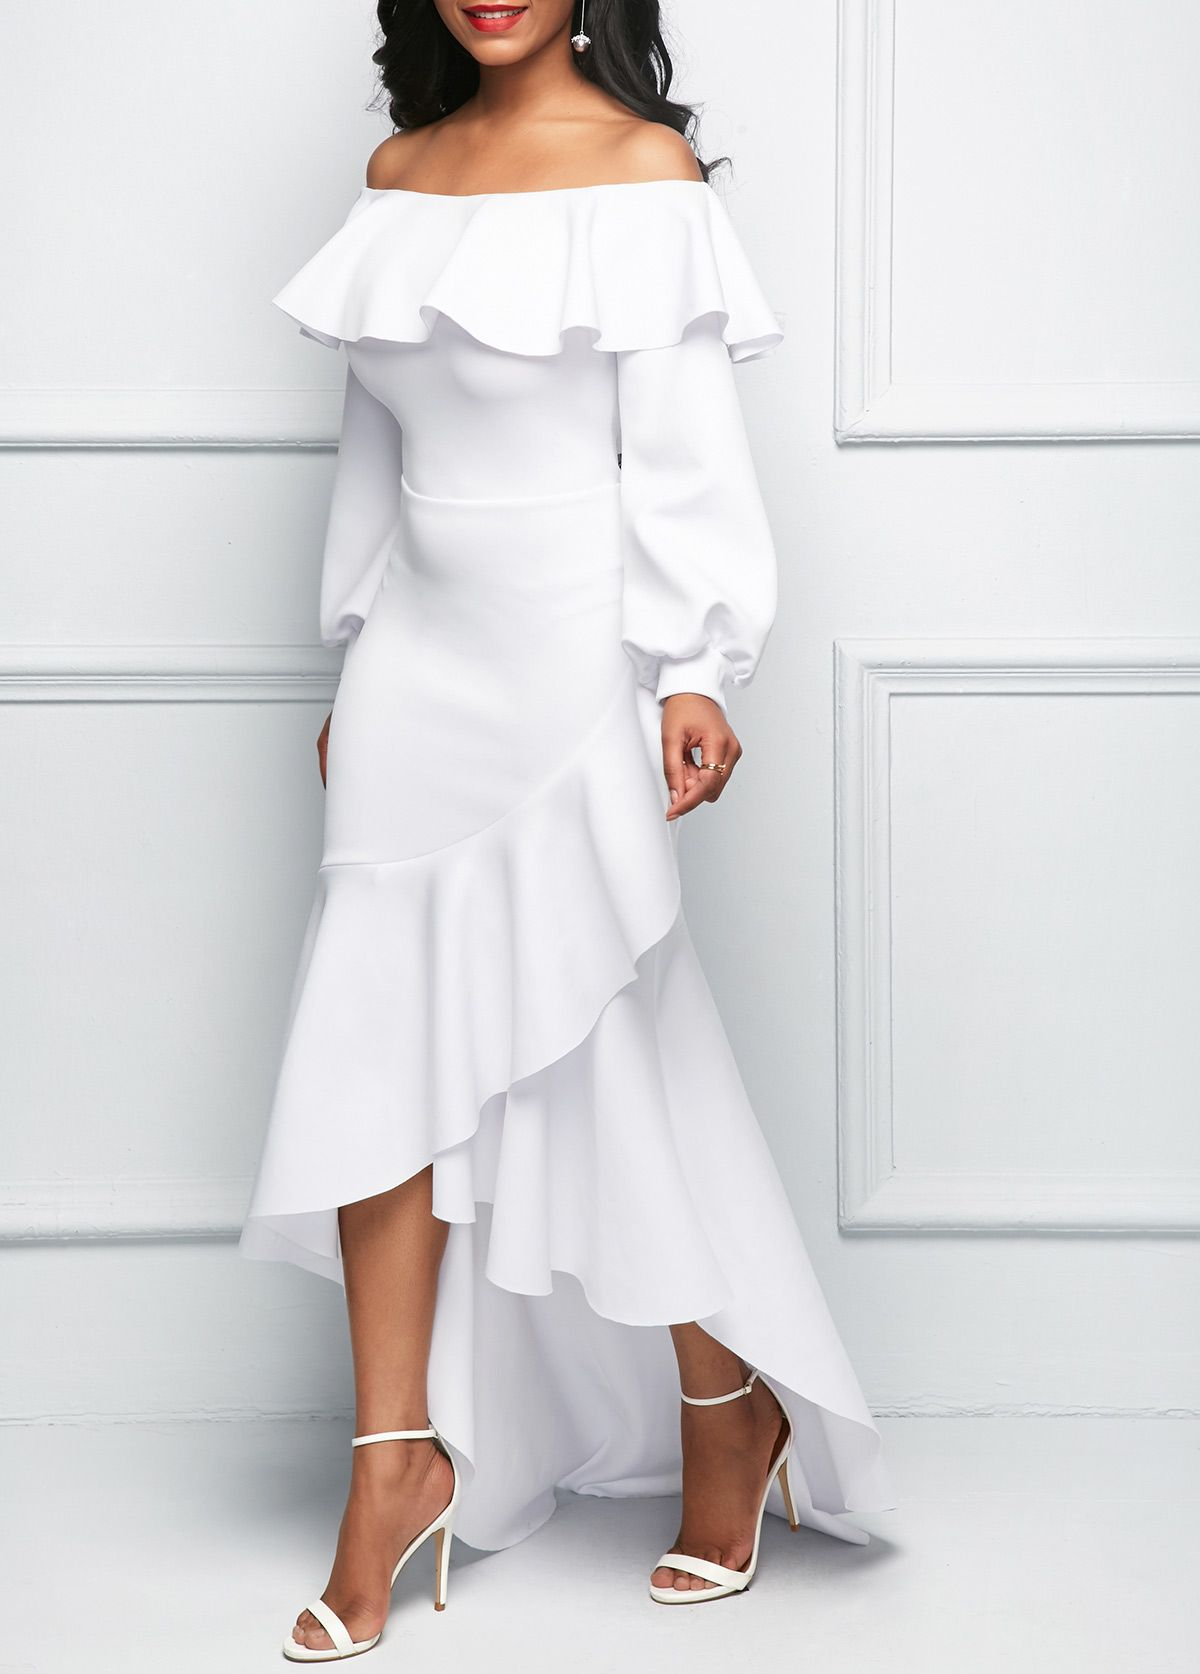 0eab5564a8c62 Lantern Sleeve Asymmetric Ruffle Hem White Dress | Rosewe.com - USD ...